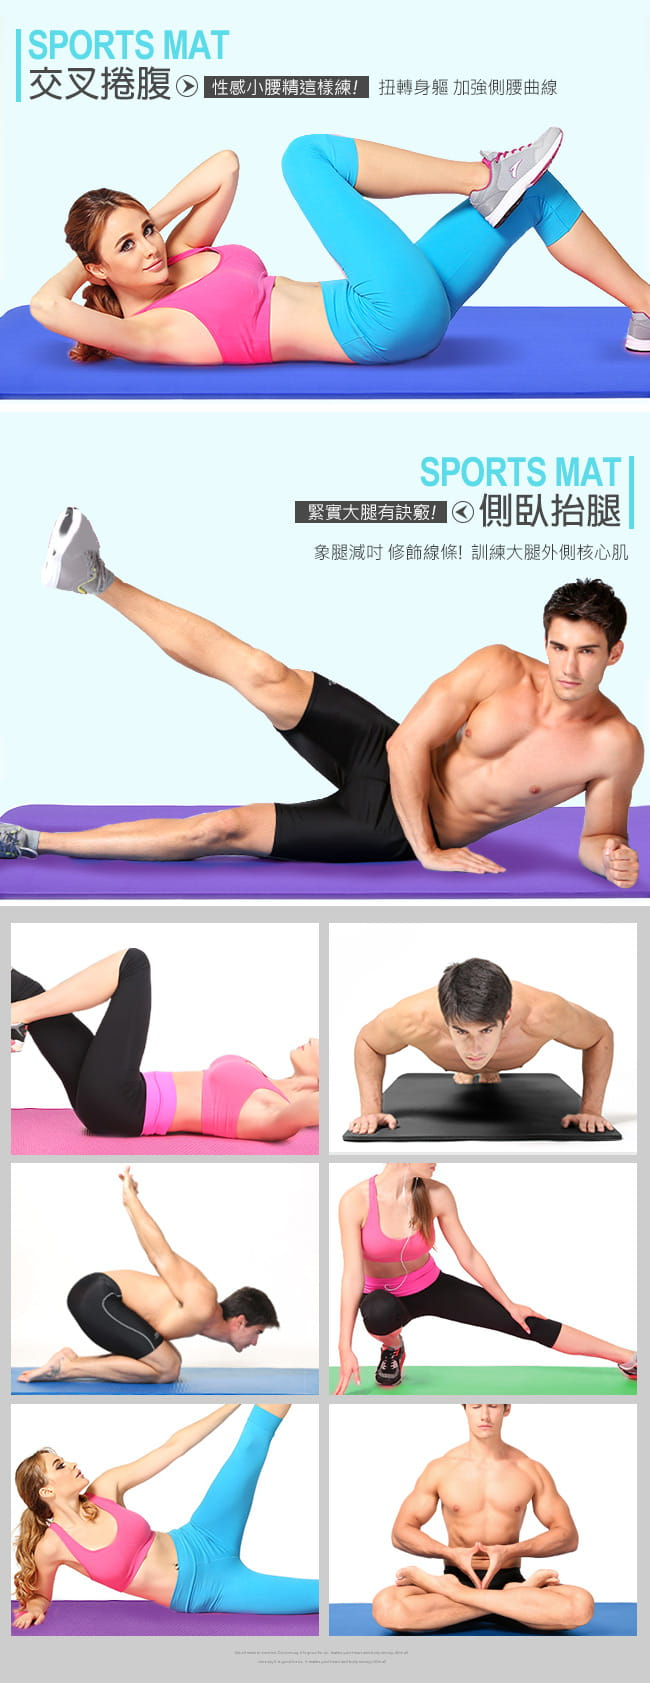 15MM加厚NBR健身墊(送束帶) 瑜珈墊止滑墊防滑墊運動墊 5